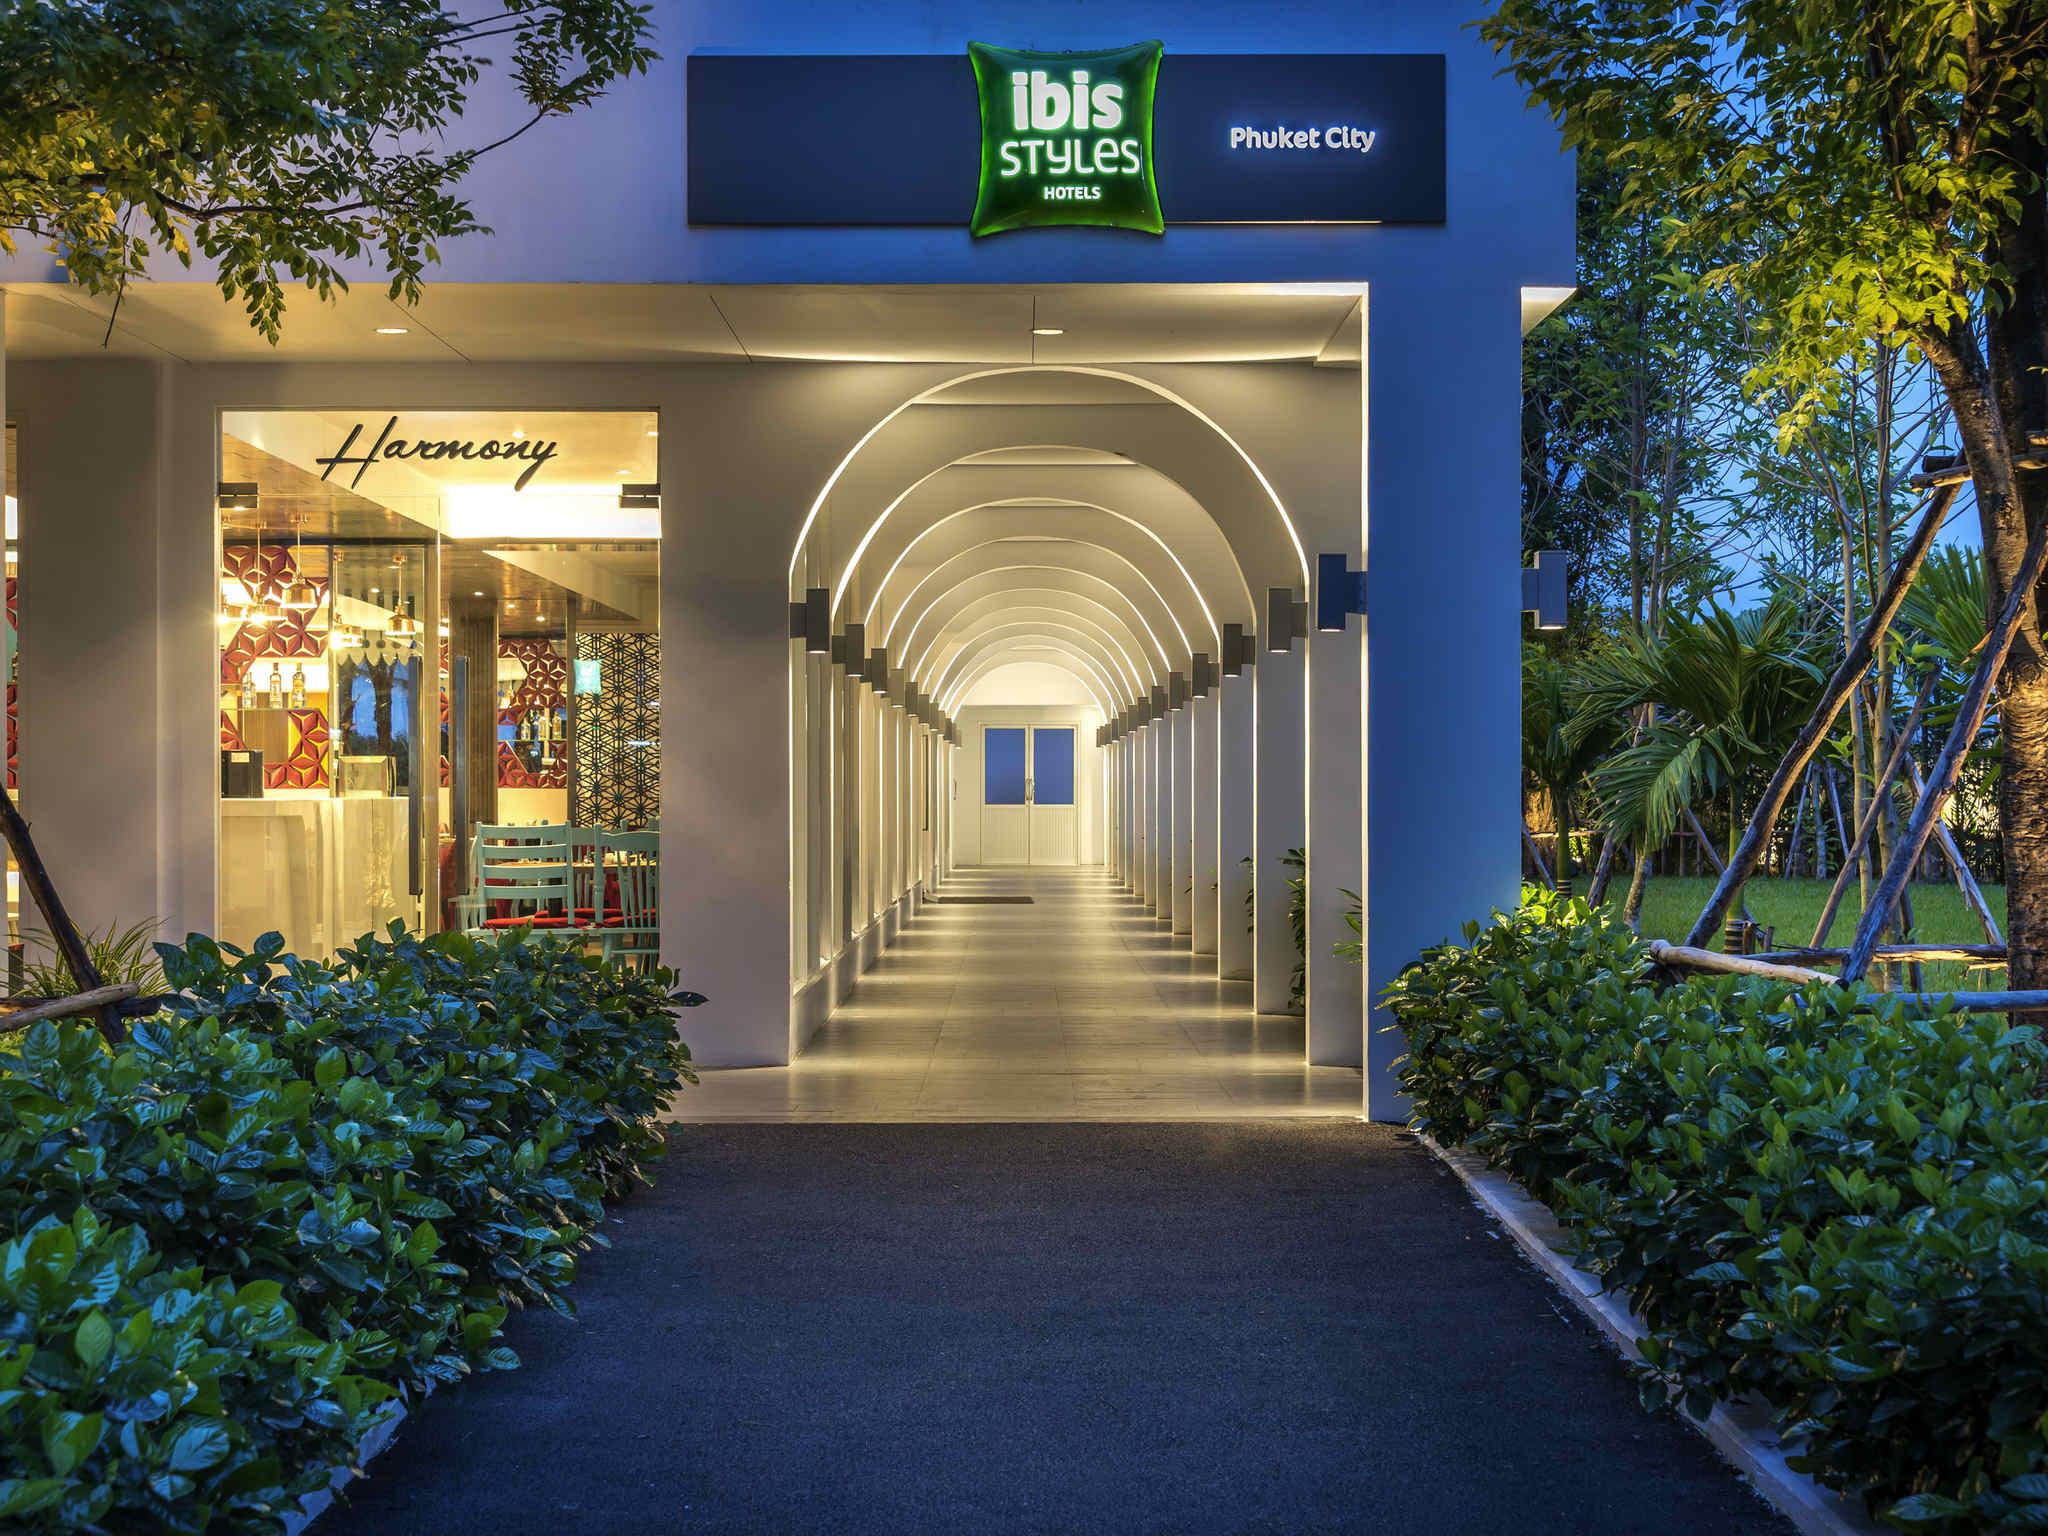 Hotel – ibis Styles Phuket City